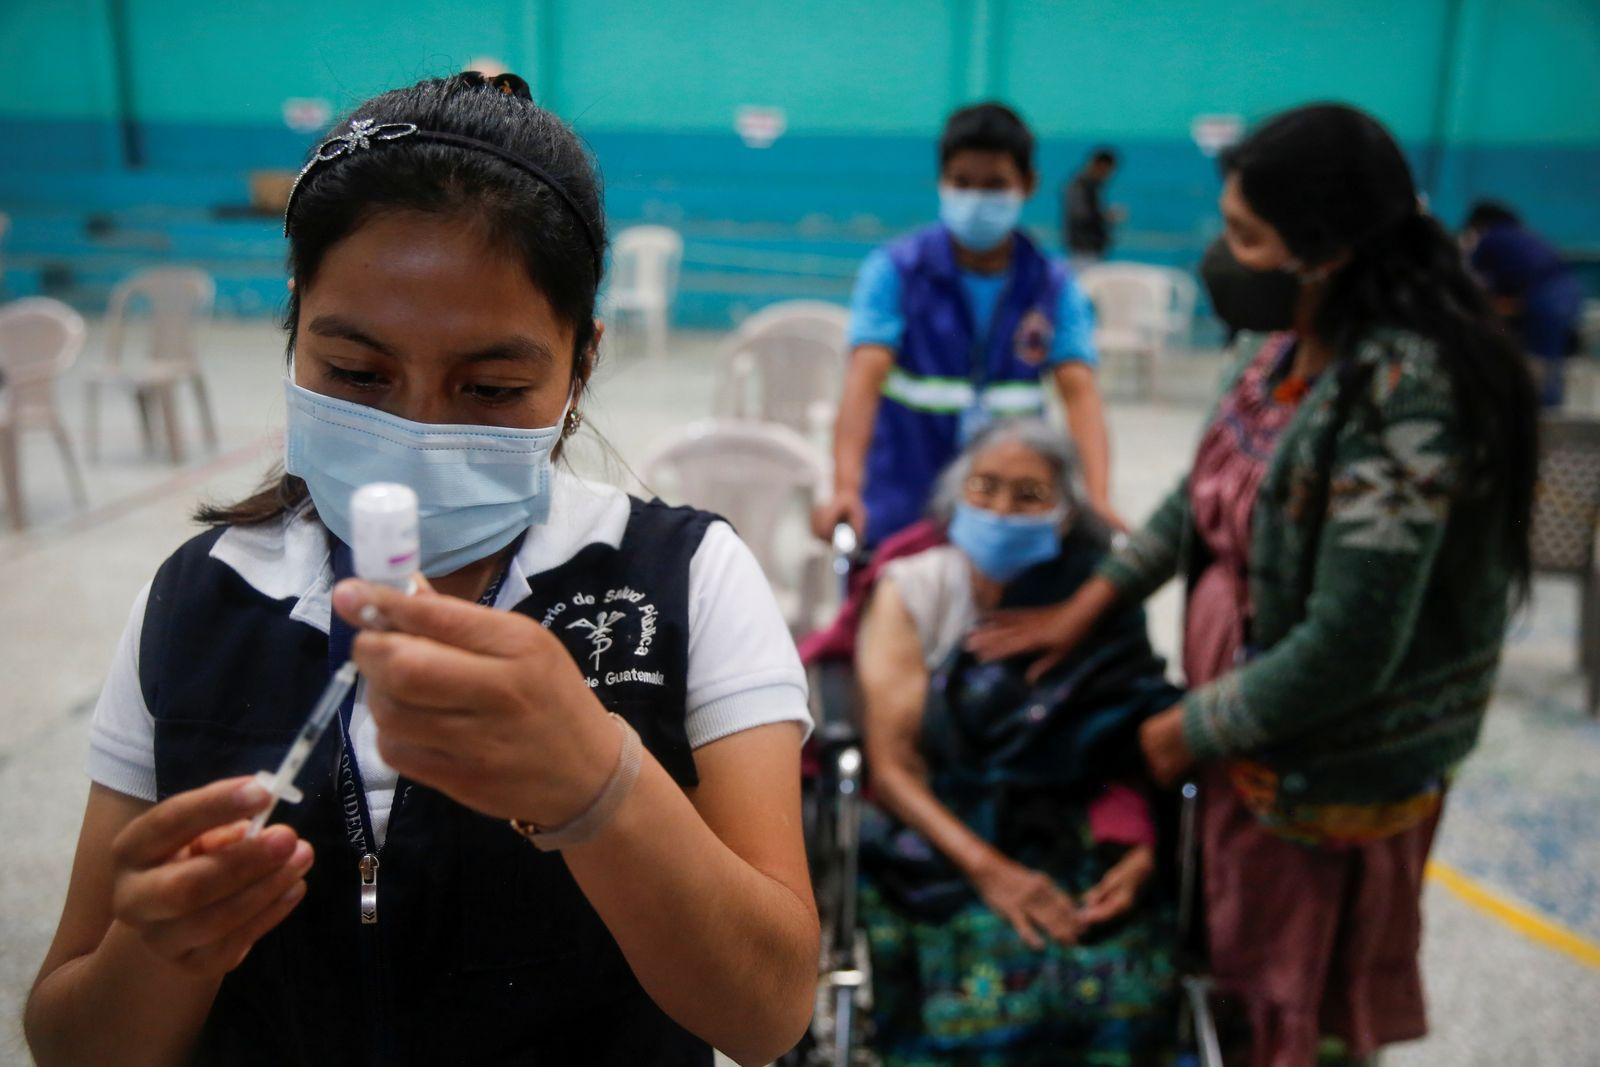 The spread of the coronavirus disease (COVID-19) in San Pedro Sacatepequez